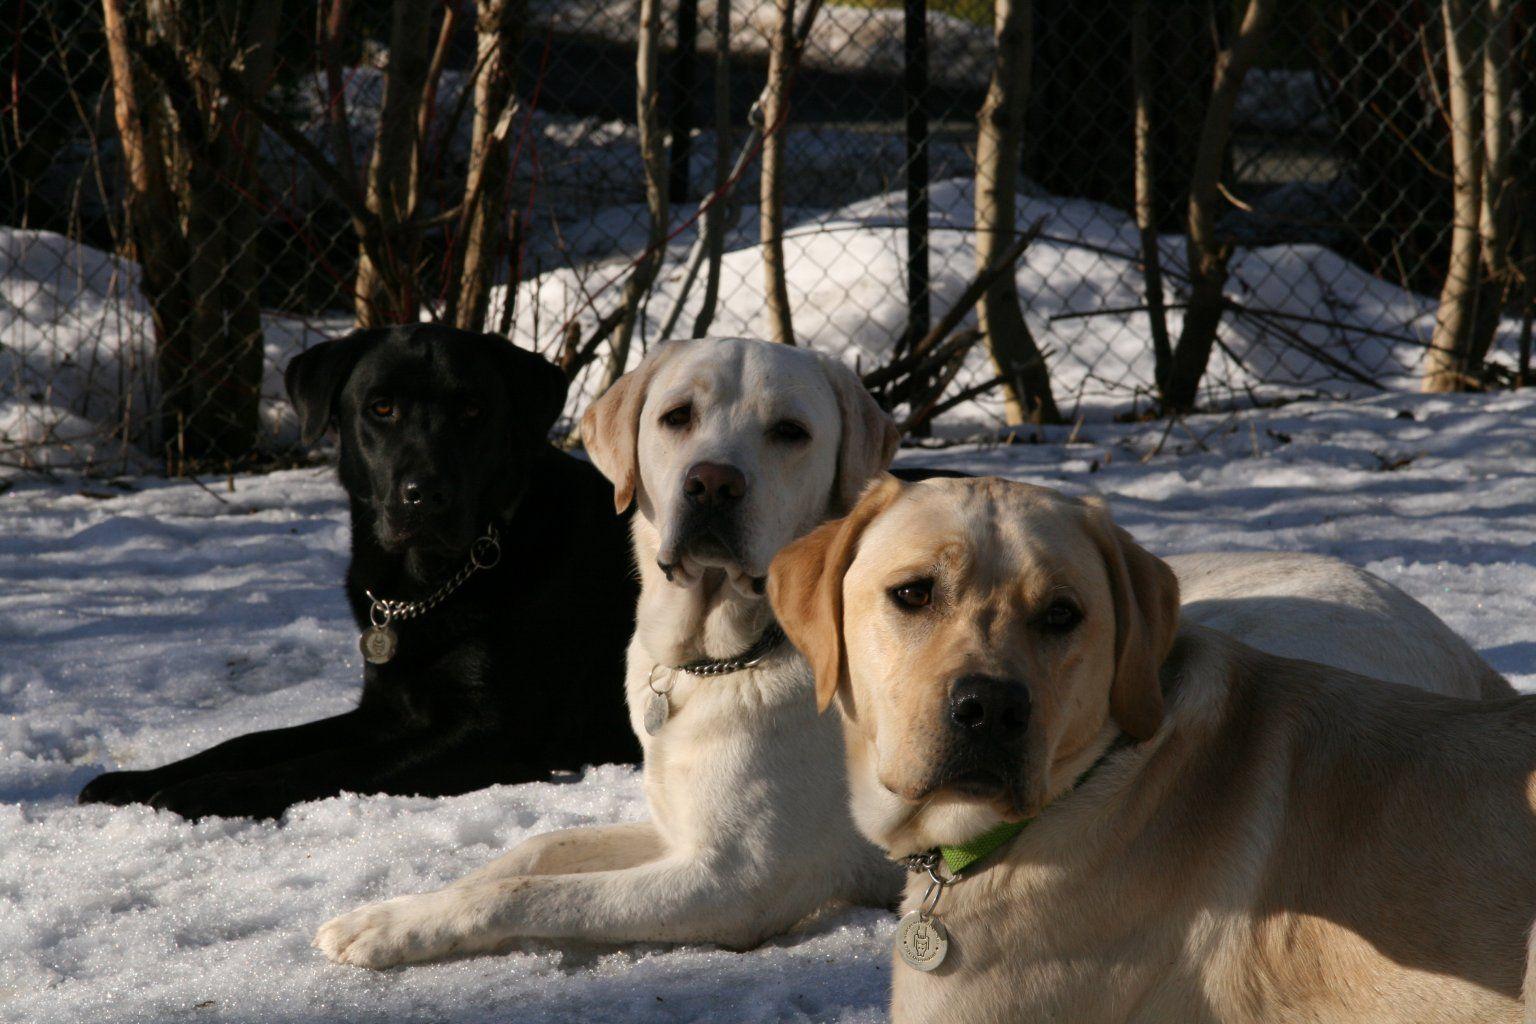 Labrador (Lab) Retriever Wallpaper, Puppy Pictures, Breed Info ...